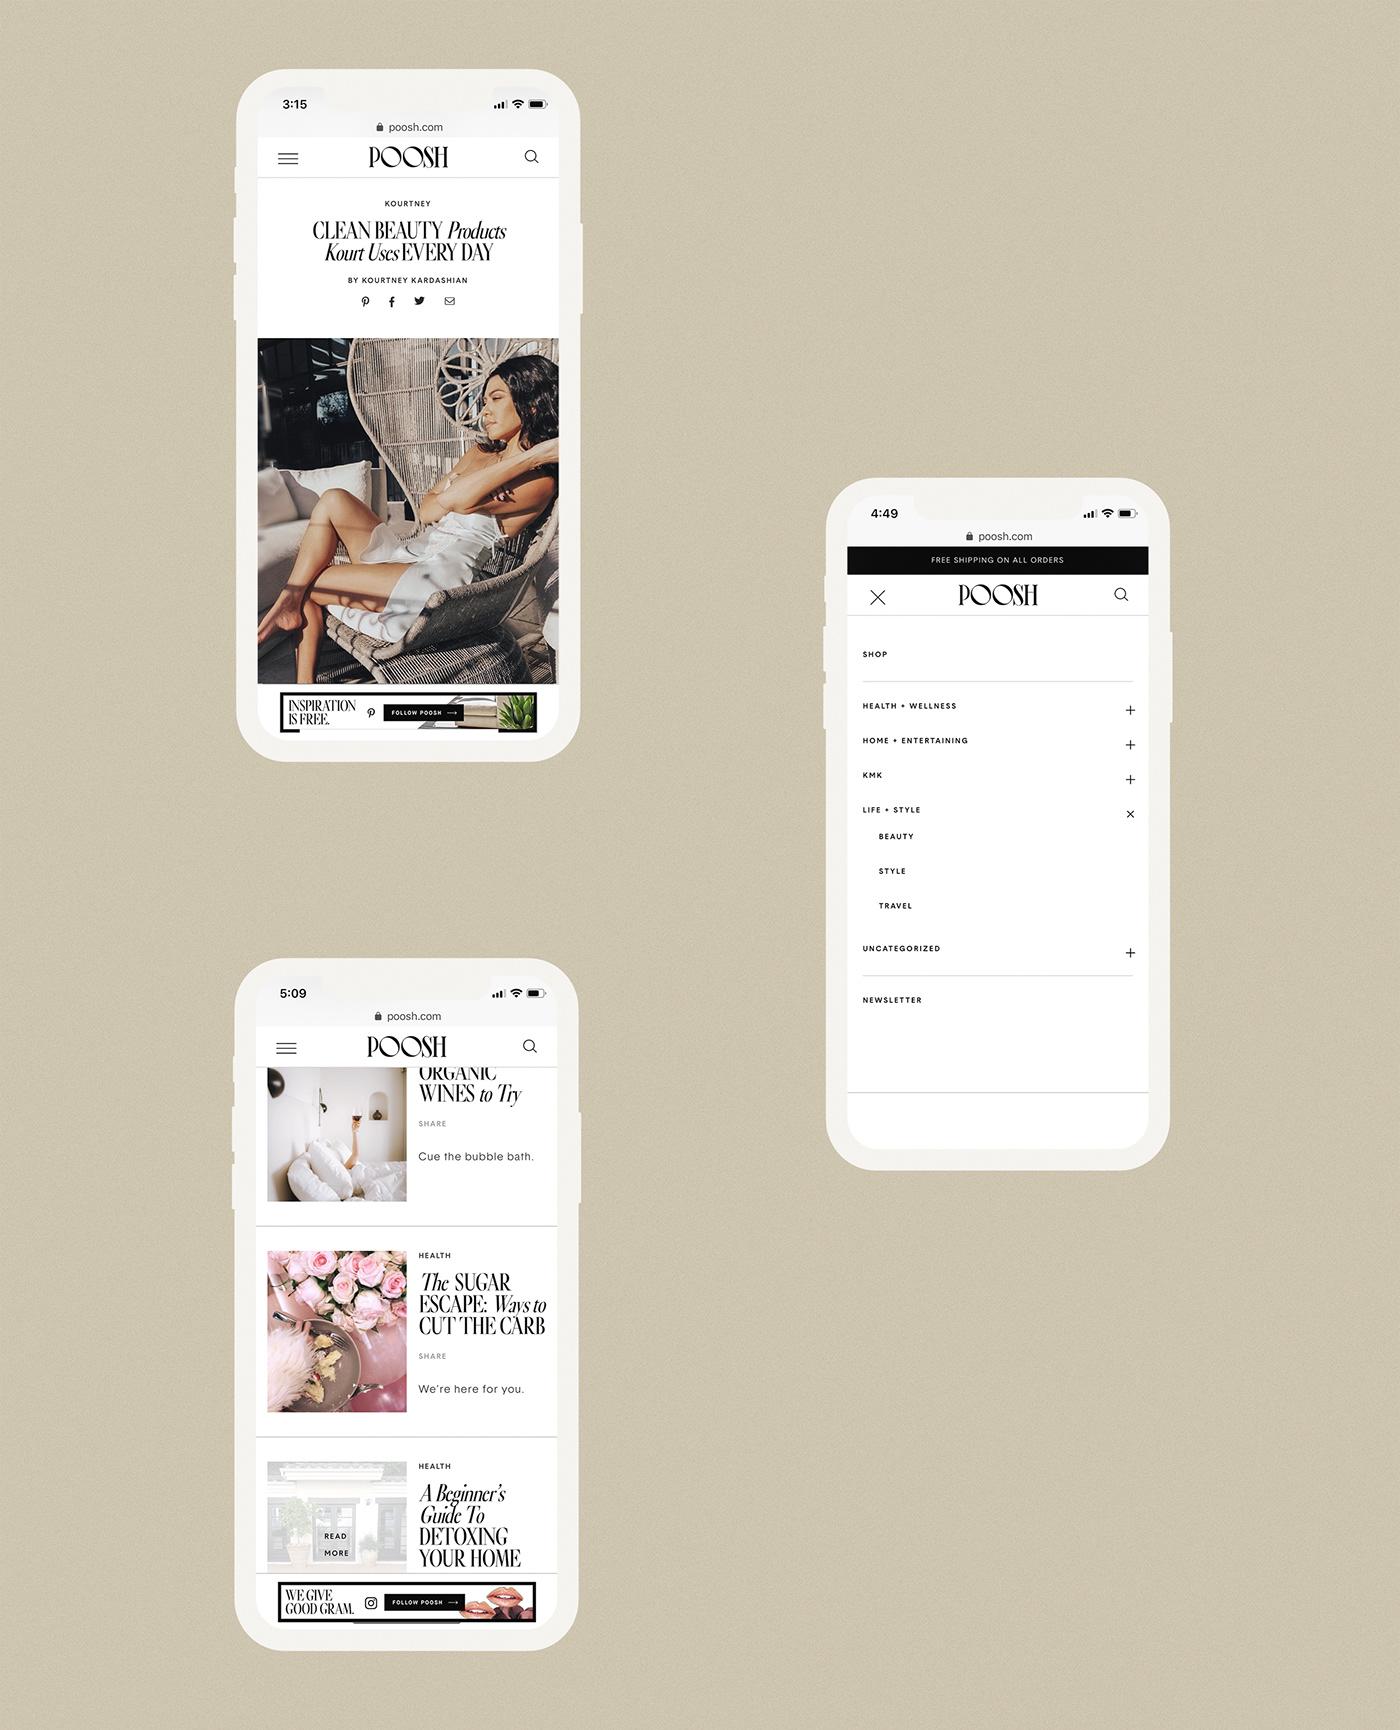 affiliate links Blog custom logo Instagram Templates mobile site typography   UI/UX Website Design wordmark wordpress